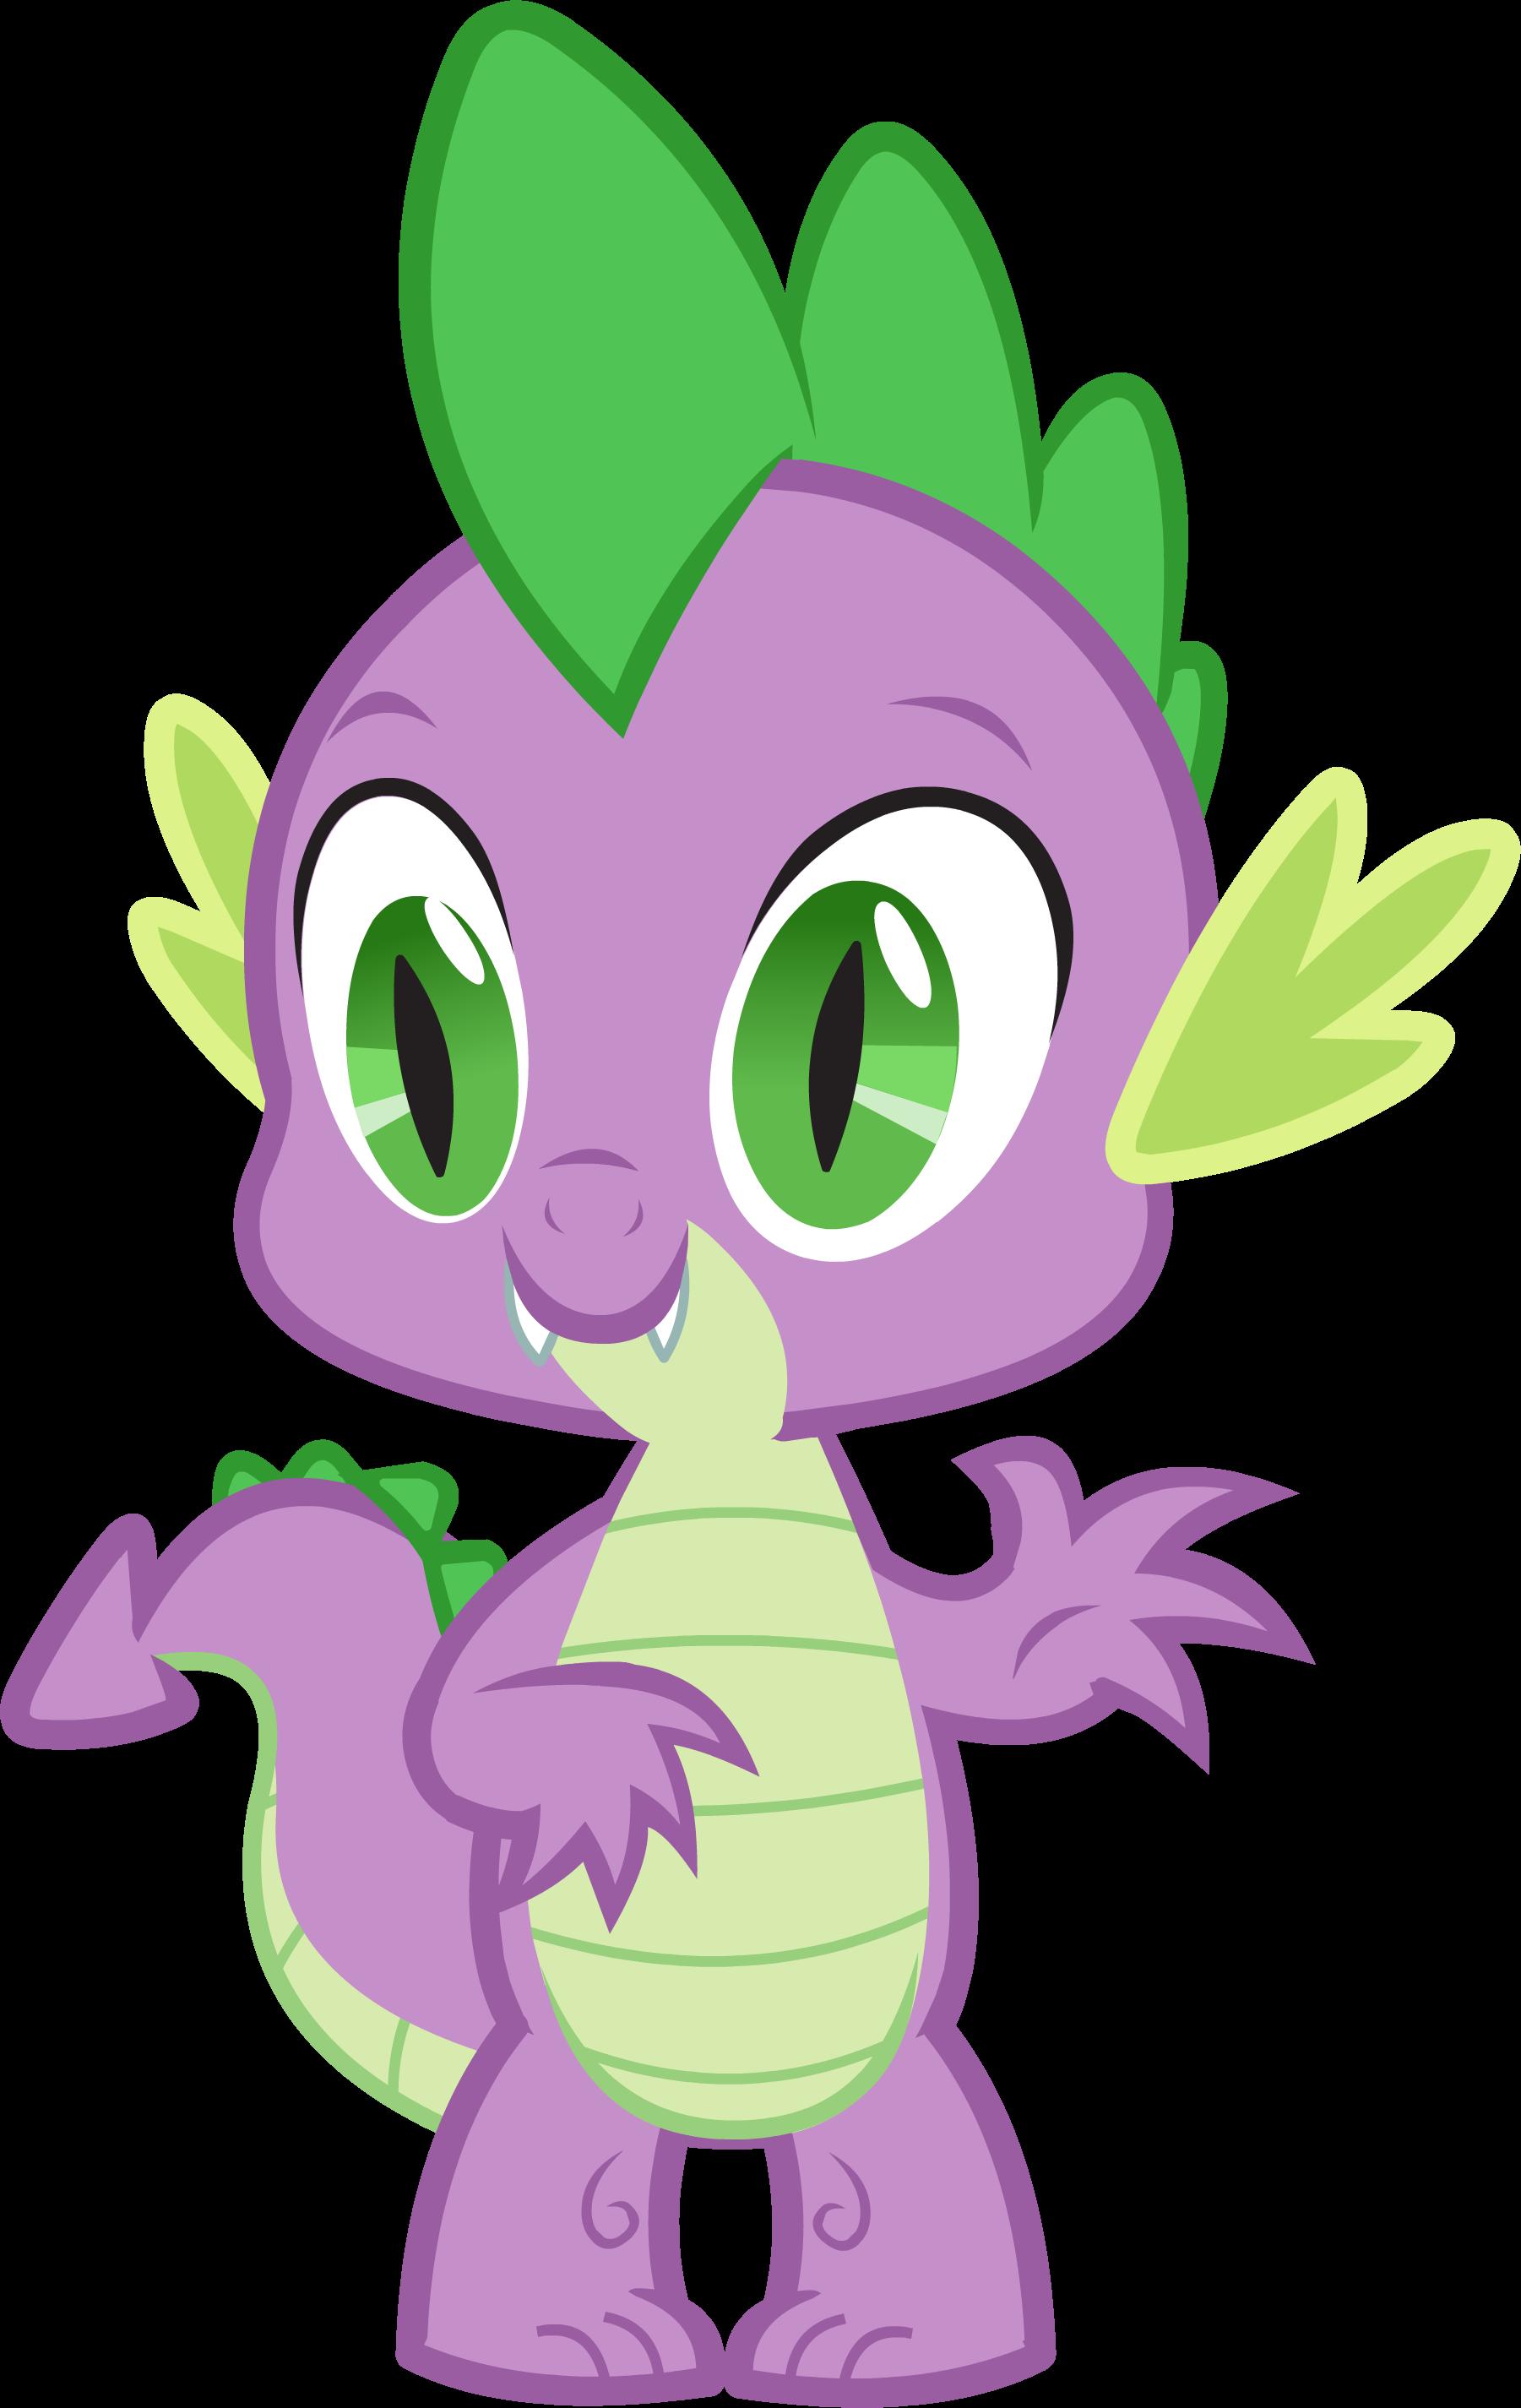 Spike ♥ | My little pony, Little pony, My little pony birthday